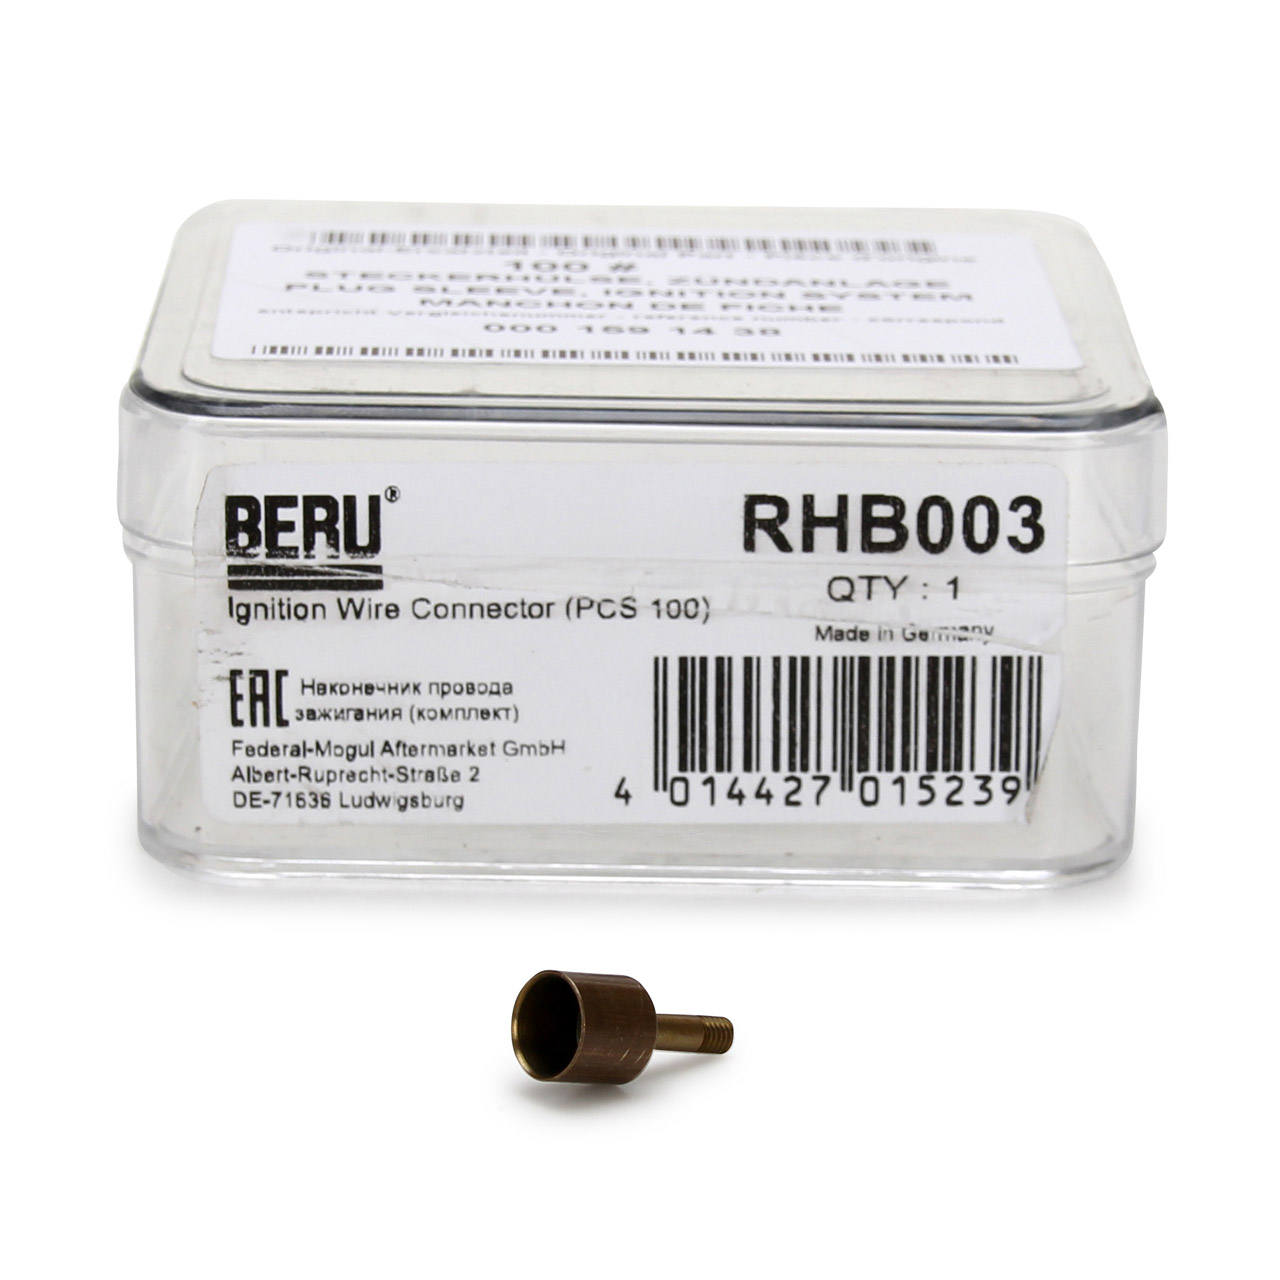 1x BERU RHB003 Steckerhülse Zündkabel für MERCEDES 190 W201 W202 W210 W140 R129